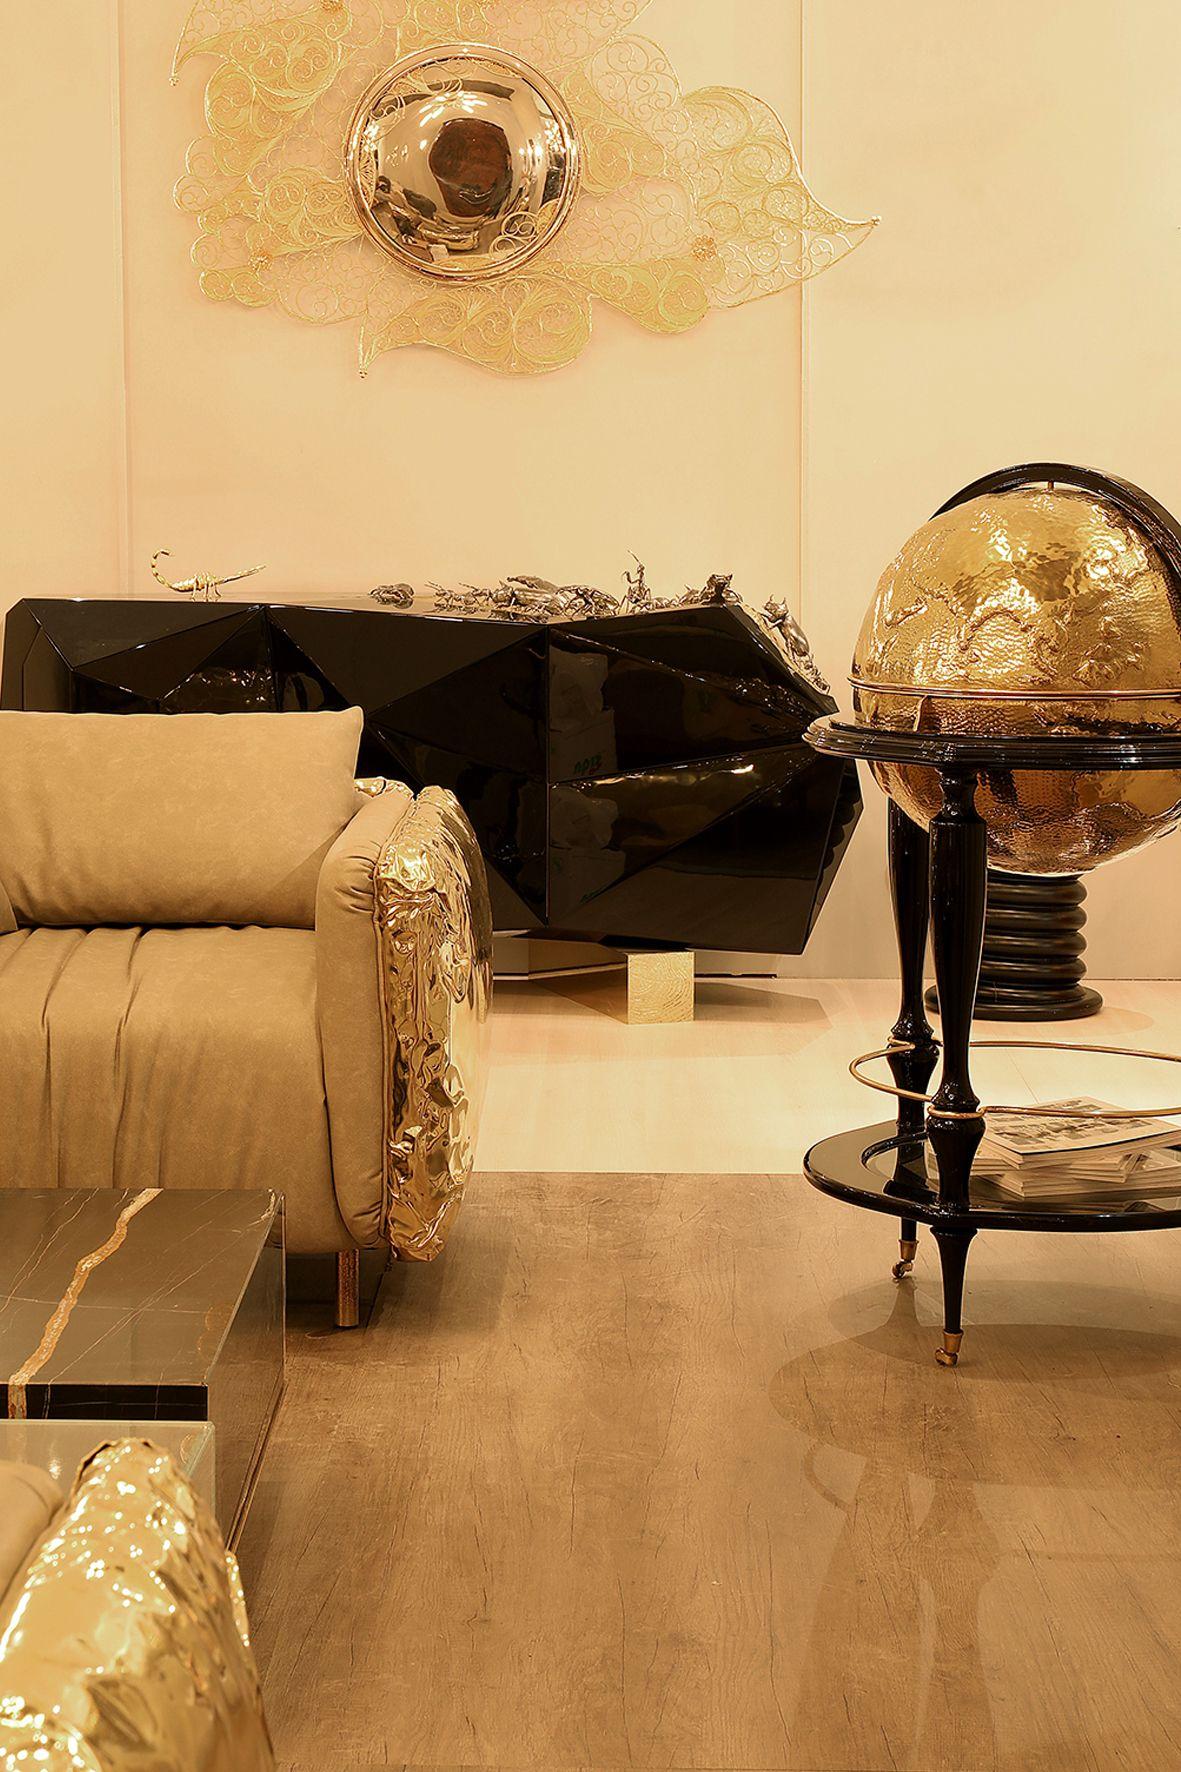 BOCA DO LOBO at Salone del Mobile 2017 | iSaloni 2017 #designinspiration #moderndesign #interiordesign #designhouse #curateddesign #furnituredesign #isaloni2017 #isalonimilano #isalonifurniture #isaloni #bocadolobo